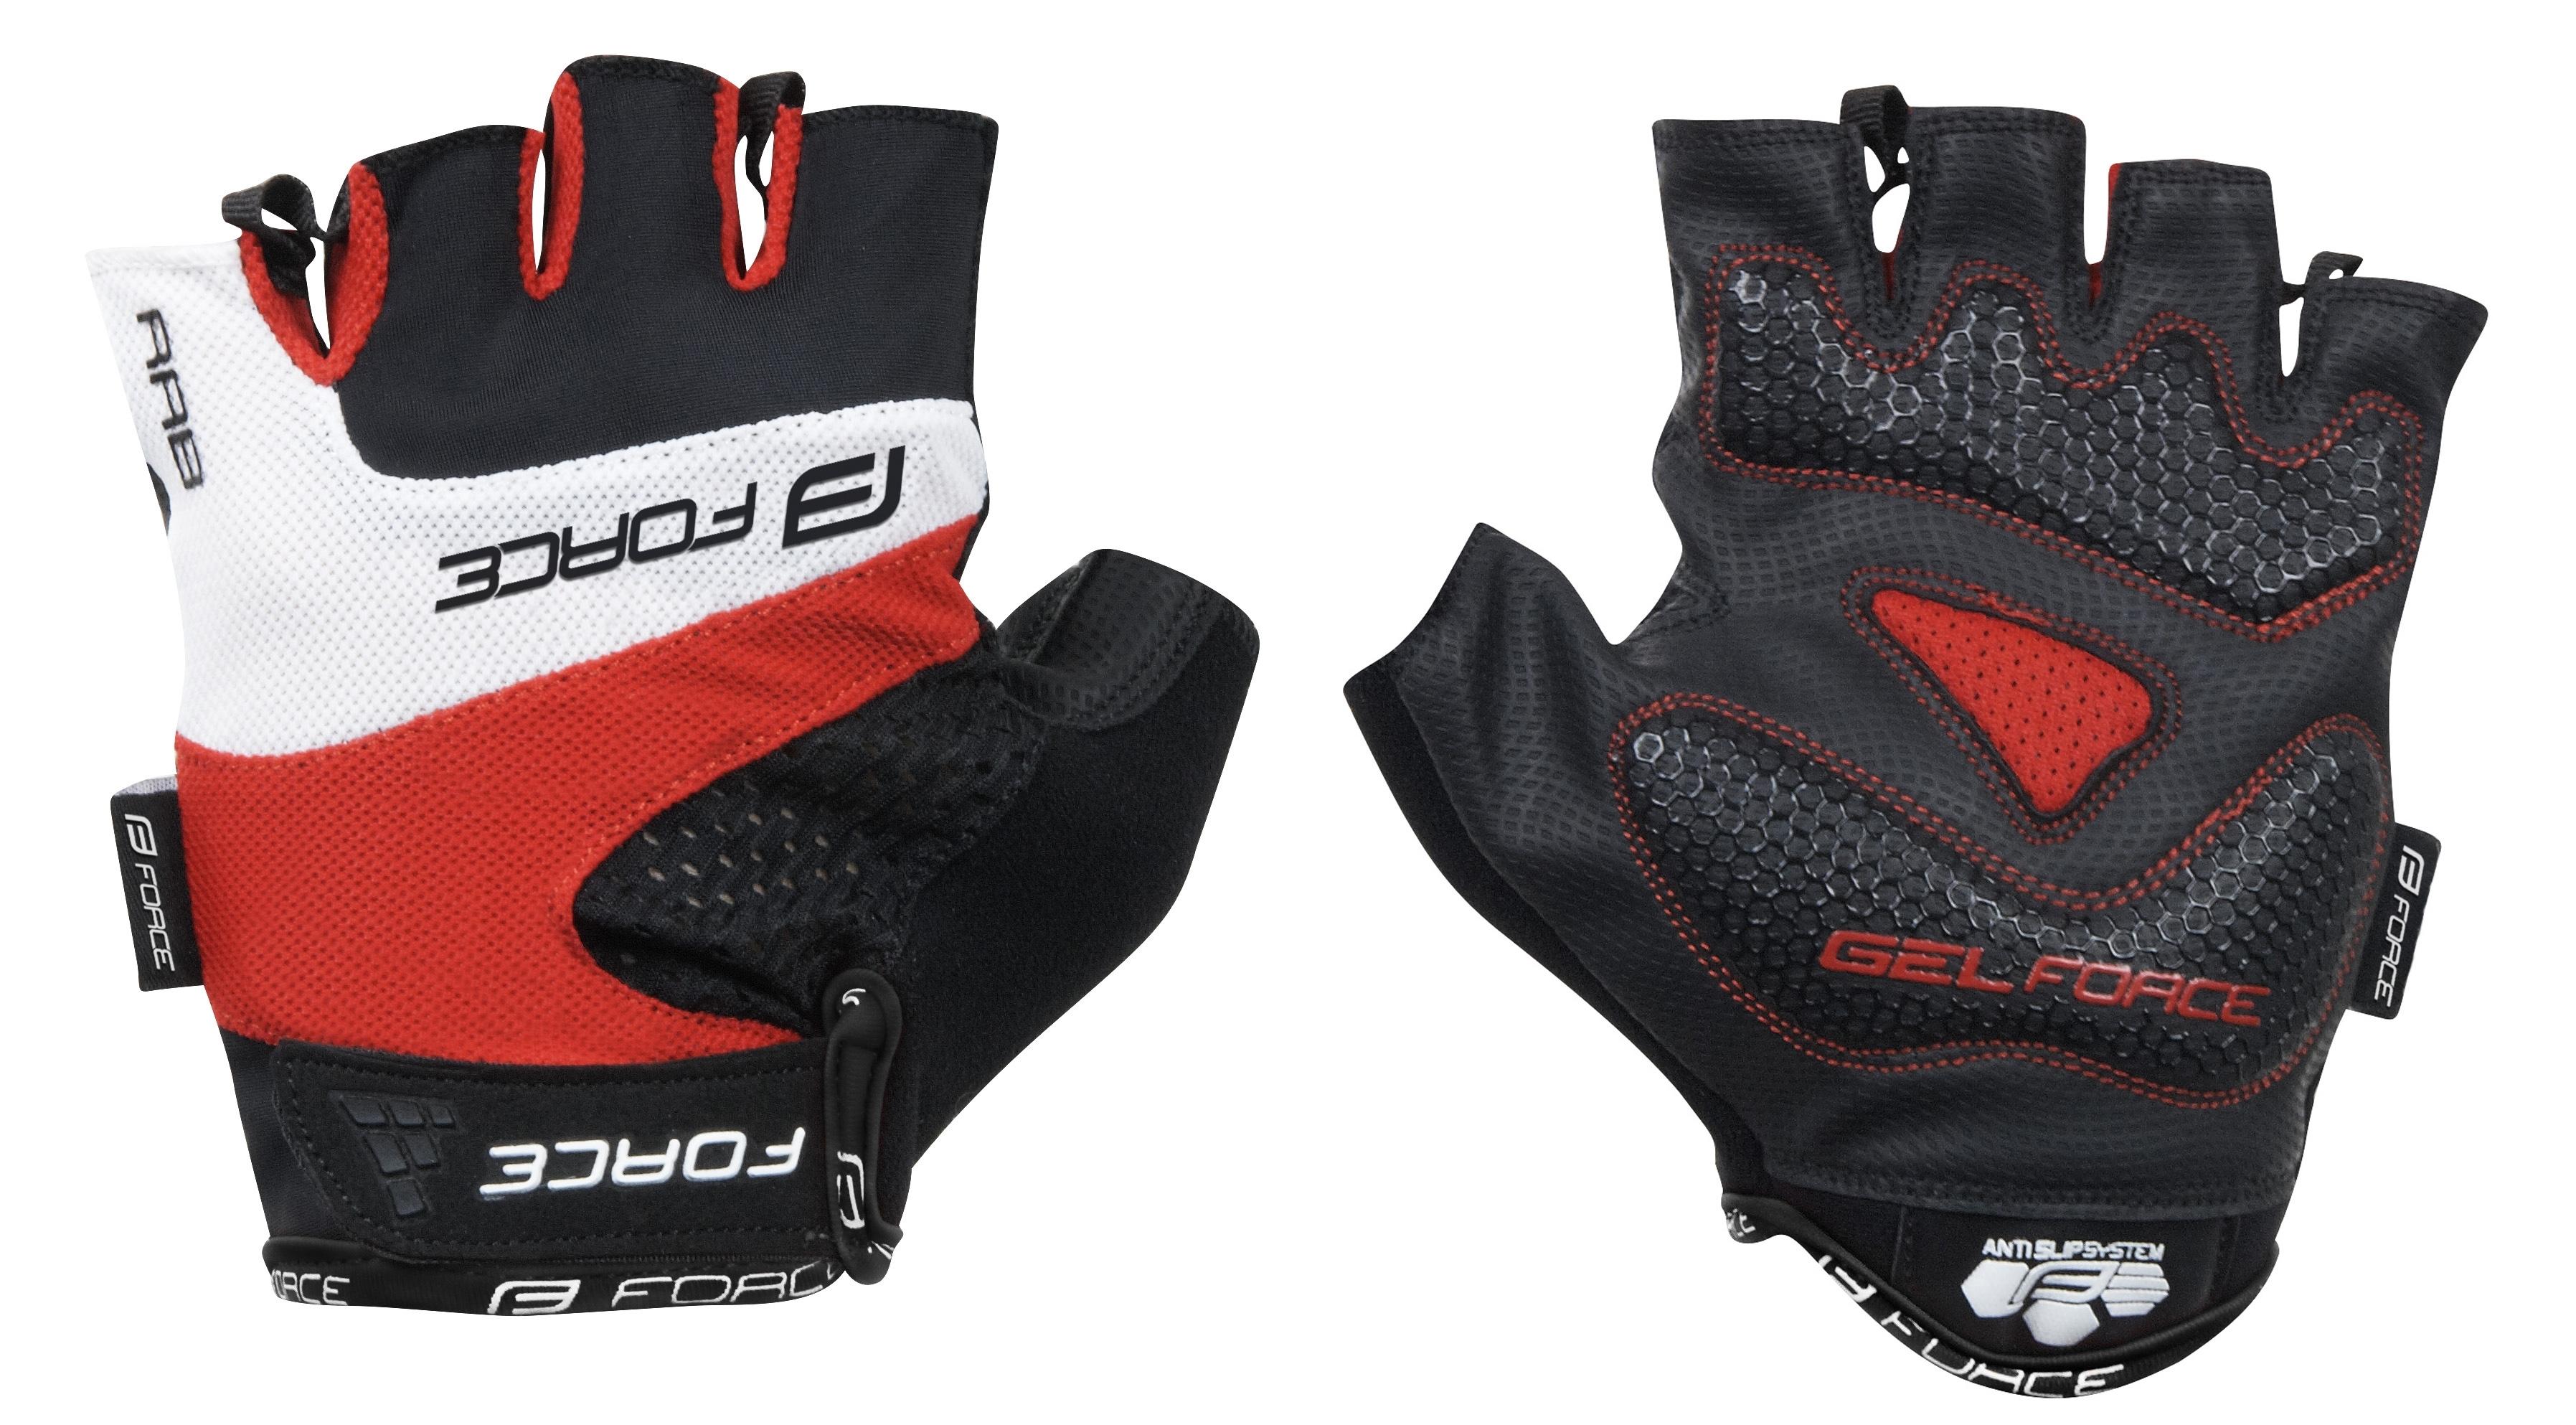 rukavice FORCE RAB gel, červené XL